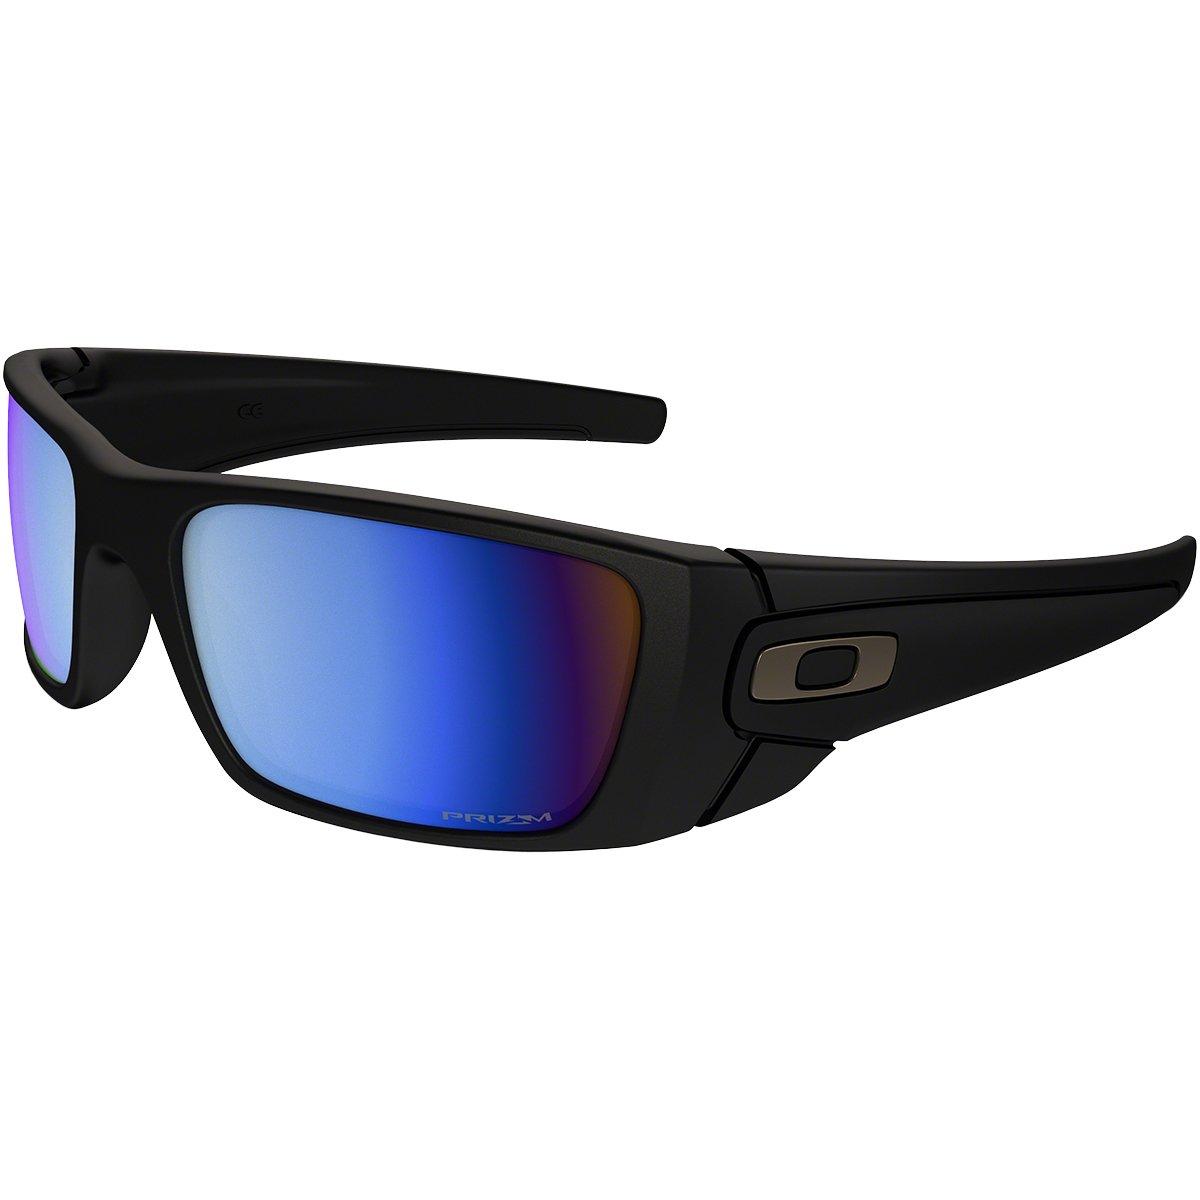 Oakley Men's OO9096 Fuel Cell Rectangular Sunglasses, Matte Black/Prizm Deep H2O Polarized, 60 mm by Oakley